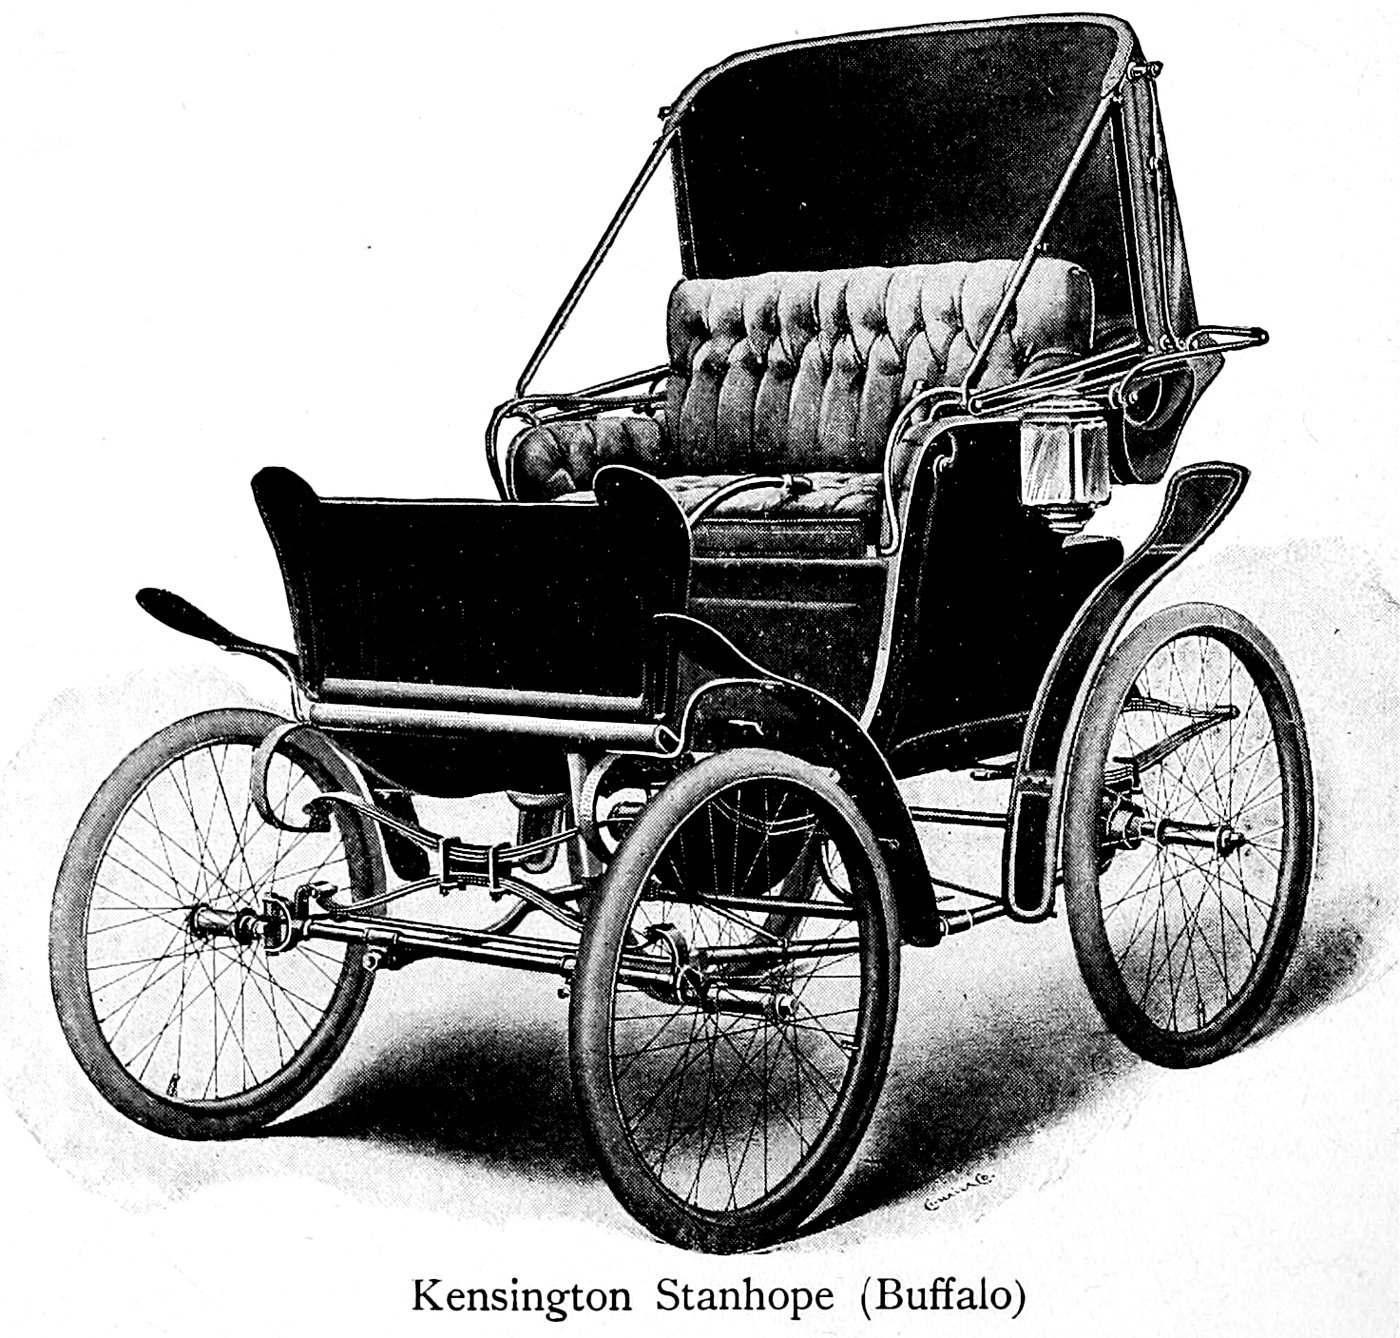 Vintage 1900s automobile -- Kensington Stanhope (Buffalo)